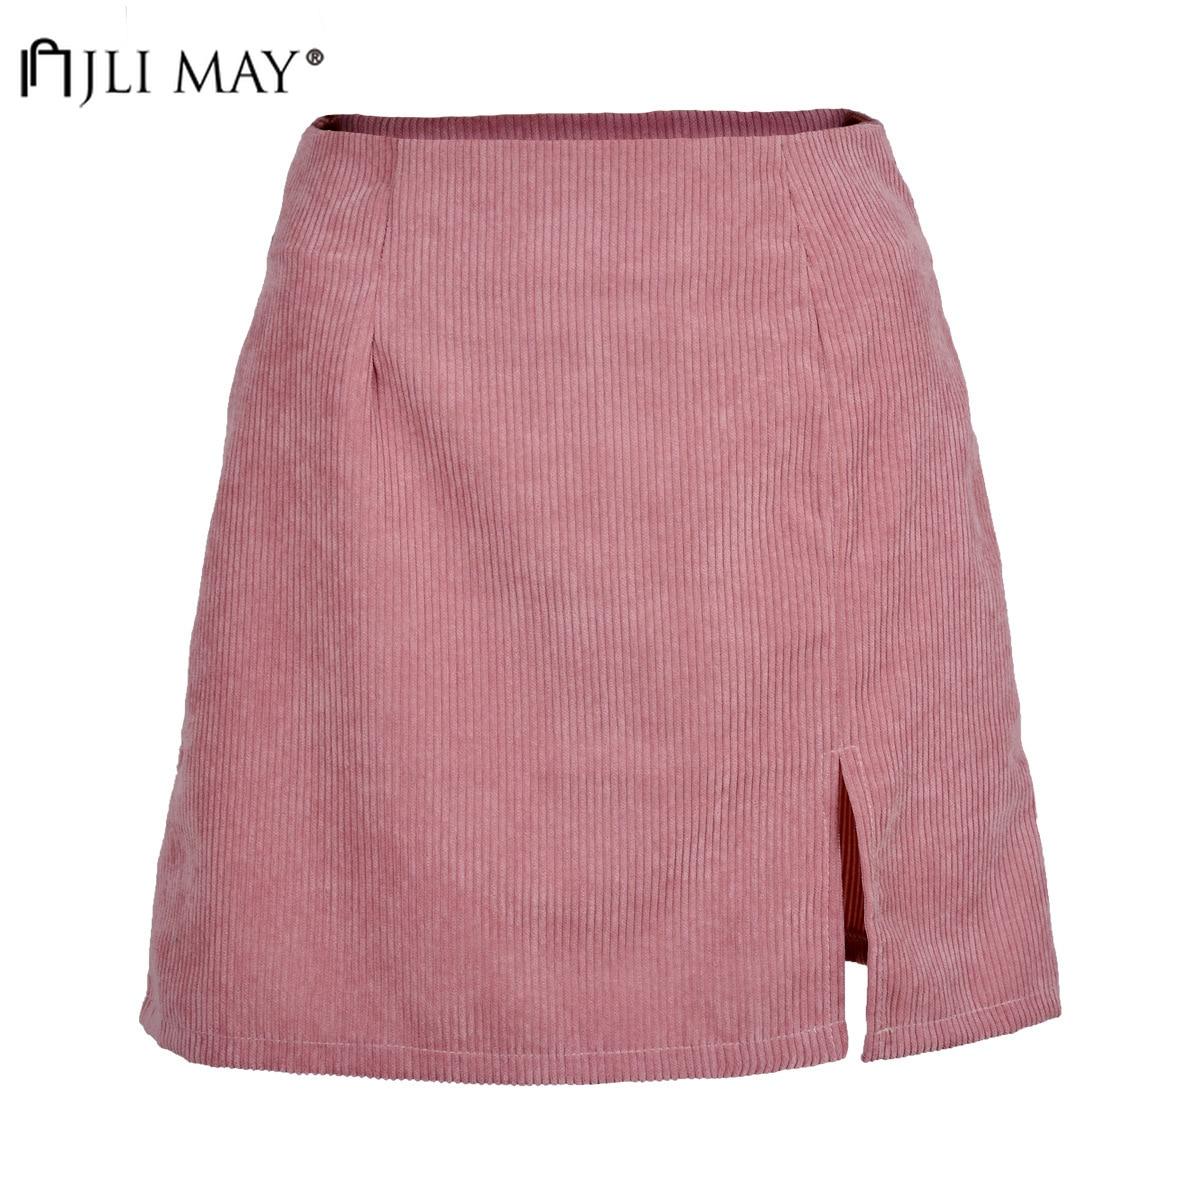 JLI MAY PANA Split A-Line Falda Mujer Casual sólido Mini alta cintura Otoño Invierno Faldas Mujer ins estilo coreano ropa